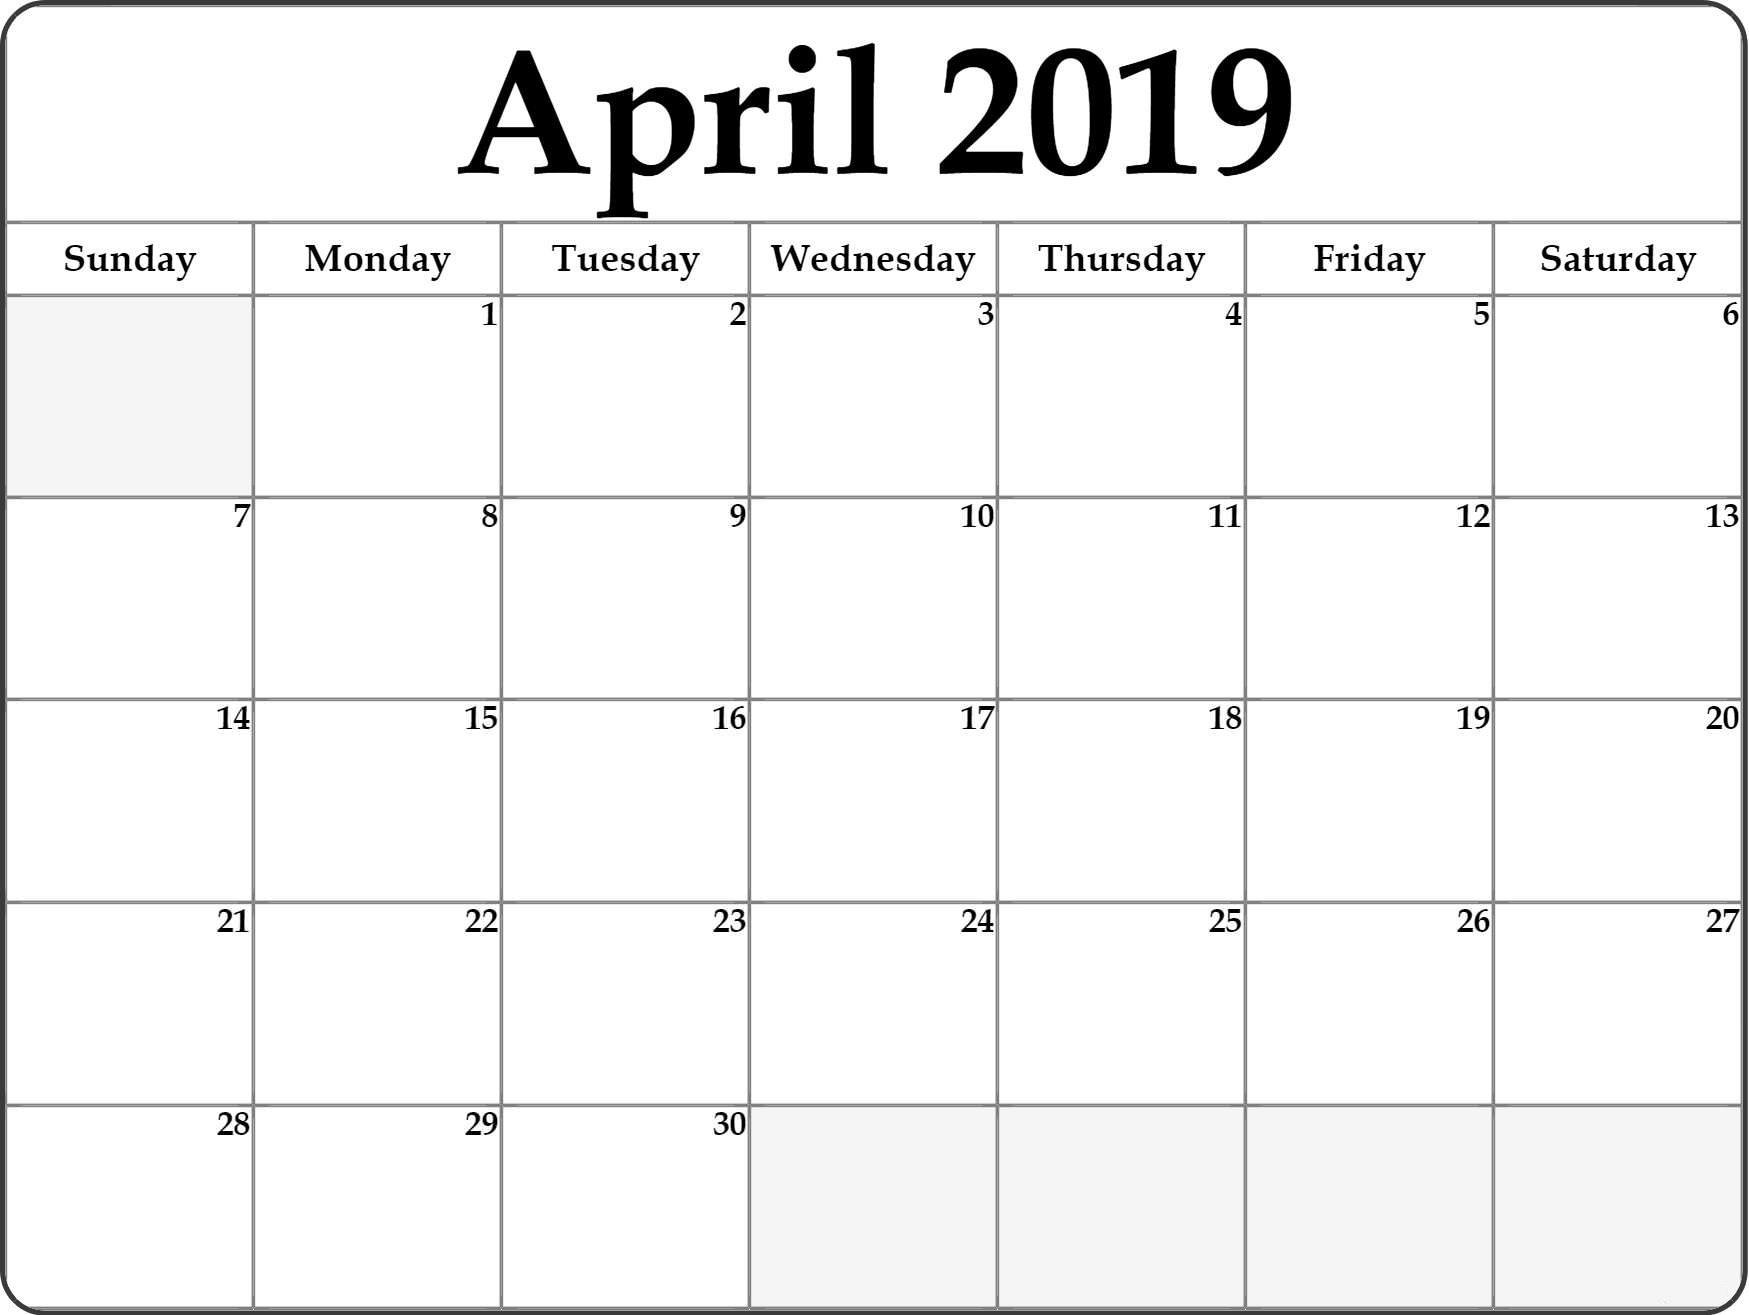 April Calendar 2019 Printable Template